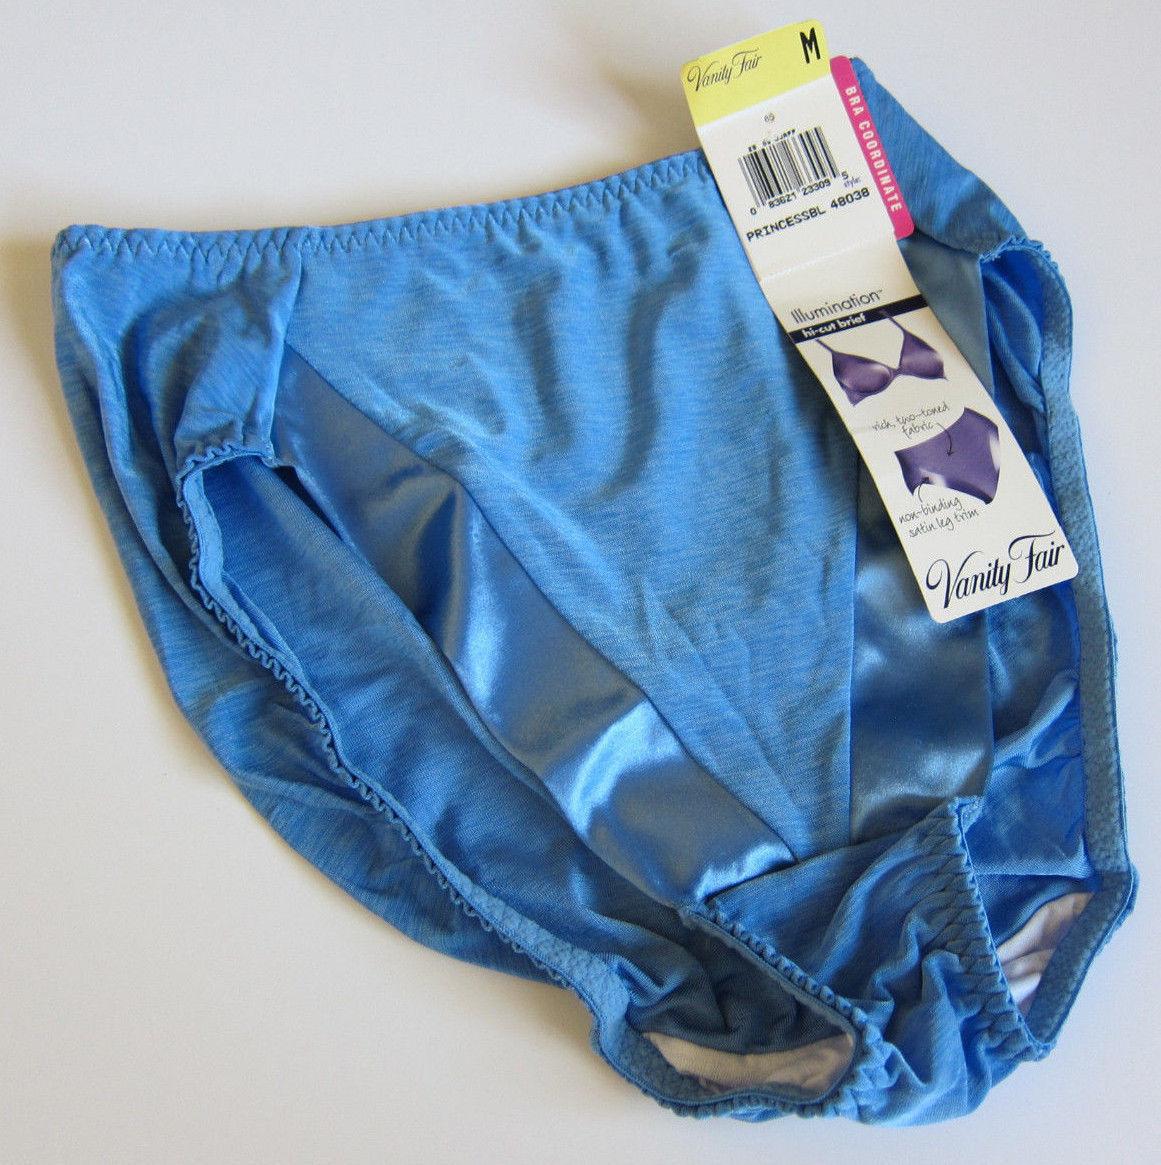 NEW VINTAGE Vanity Fair Satin V-Panel Illumination Brief Panties - SZ M  Medium - $14.84